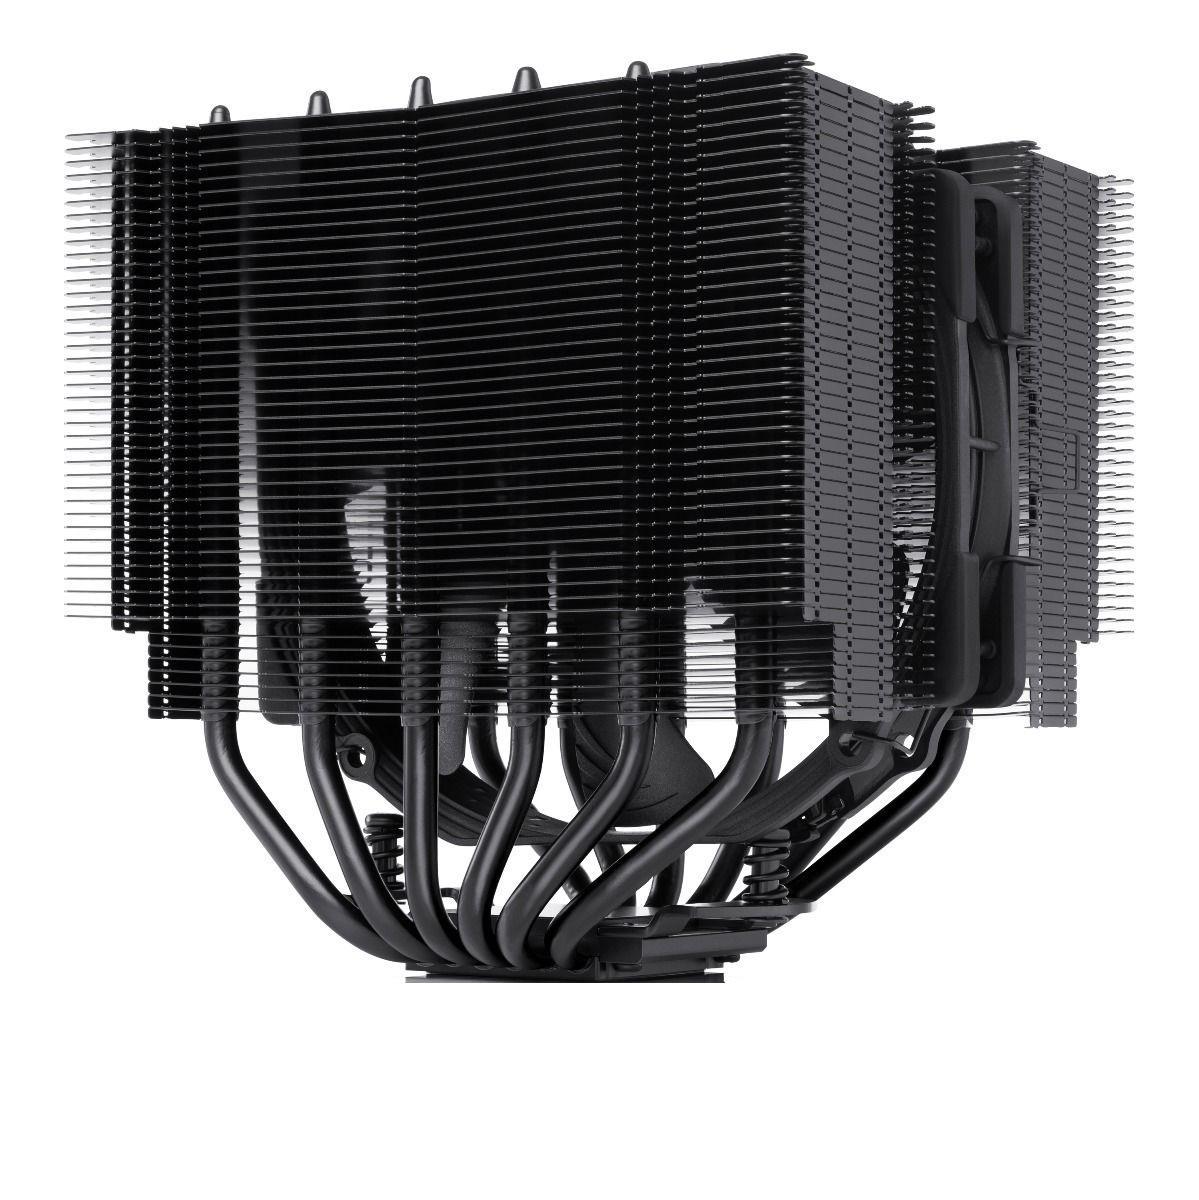 Охладител за процесор Noctua NH-D15S, Chromax.black